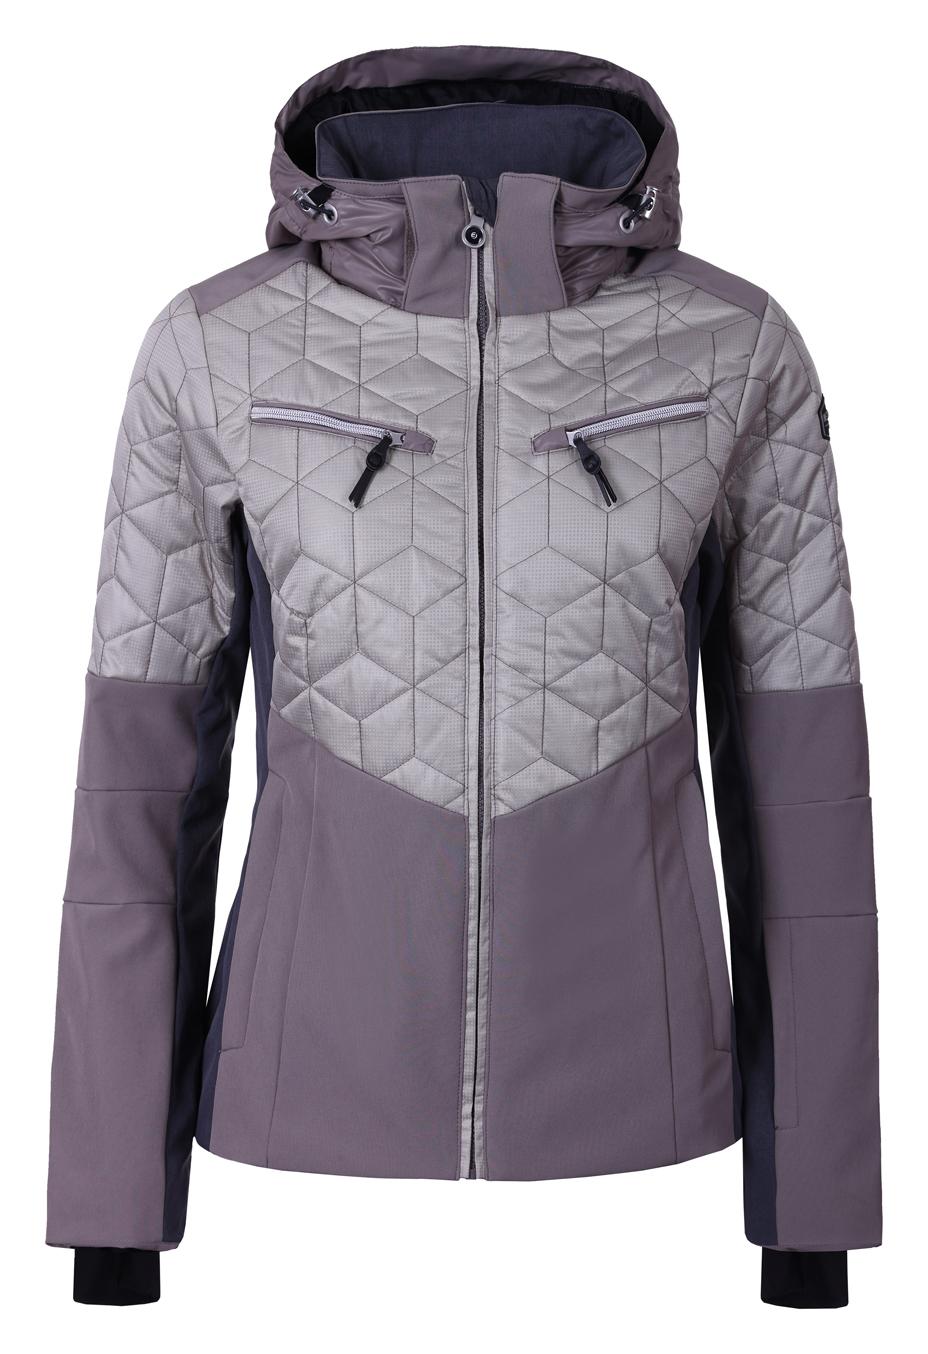 Icepeak Chloe dámska lyžiarska softshellová bunda béžová col. 080 23de5561b1f